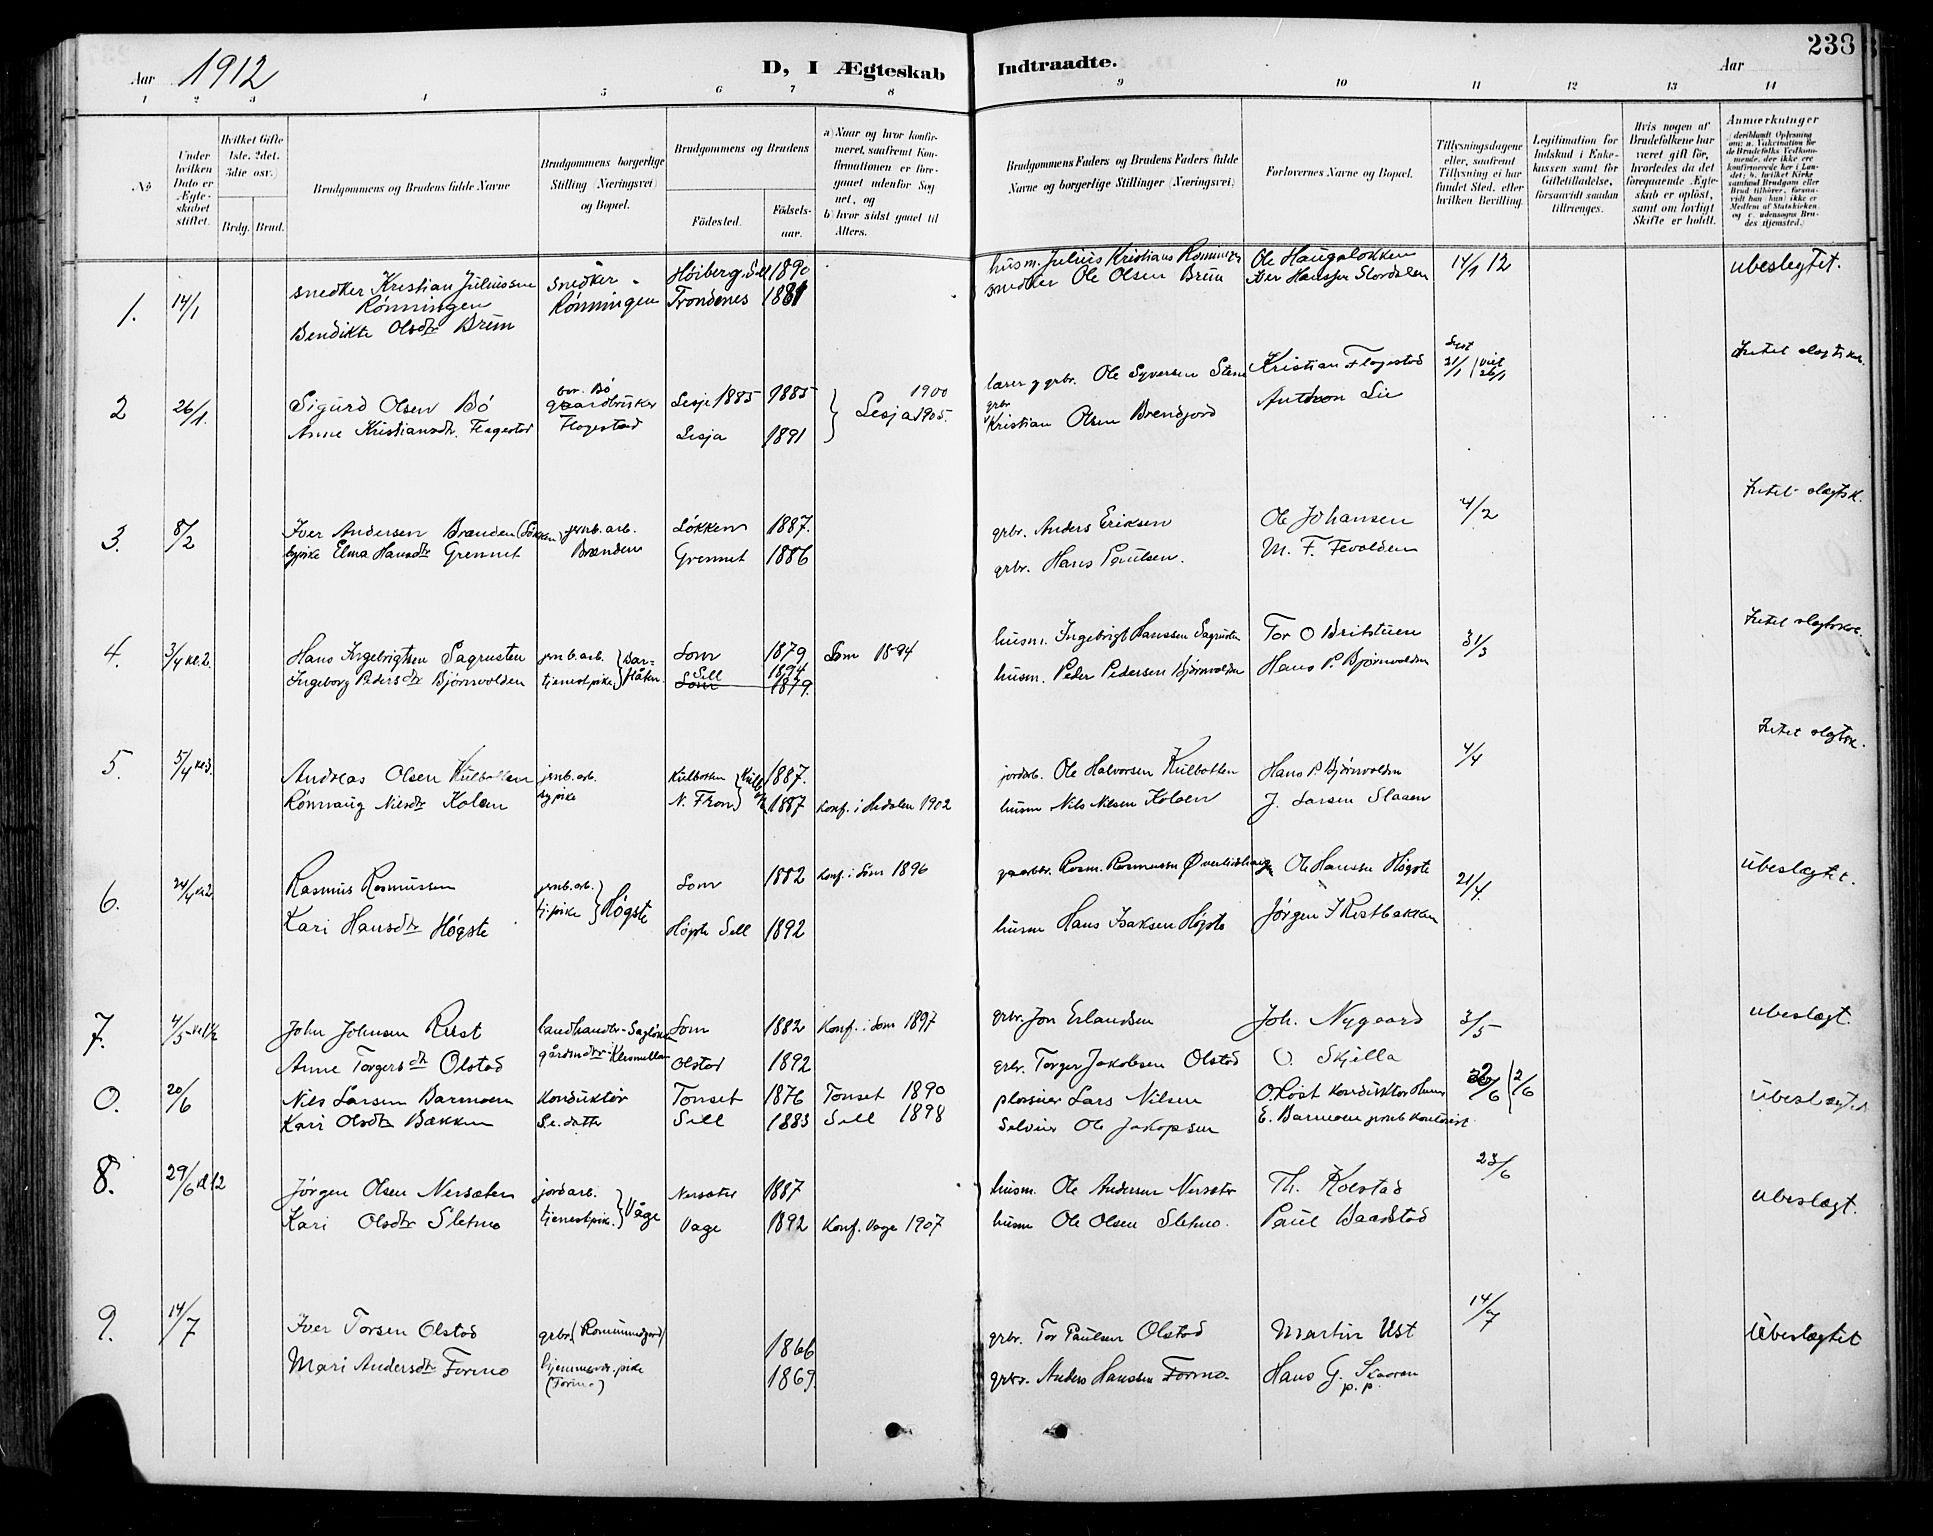 SAH, Sel prestekontor, Klokkerbok nr. 1, 1894-1923, s. 238